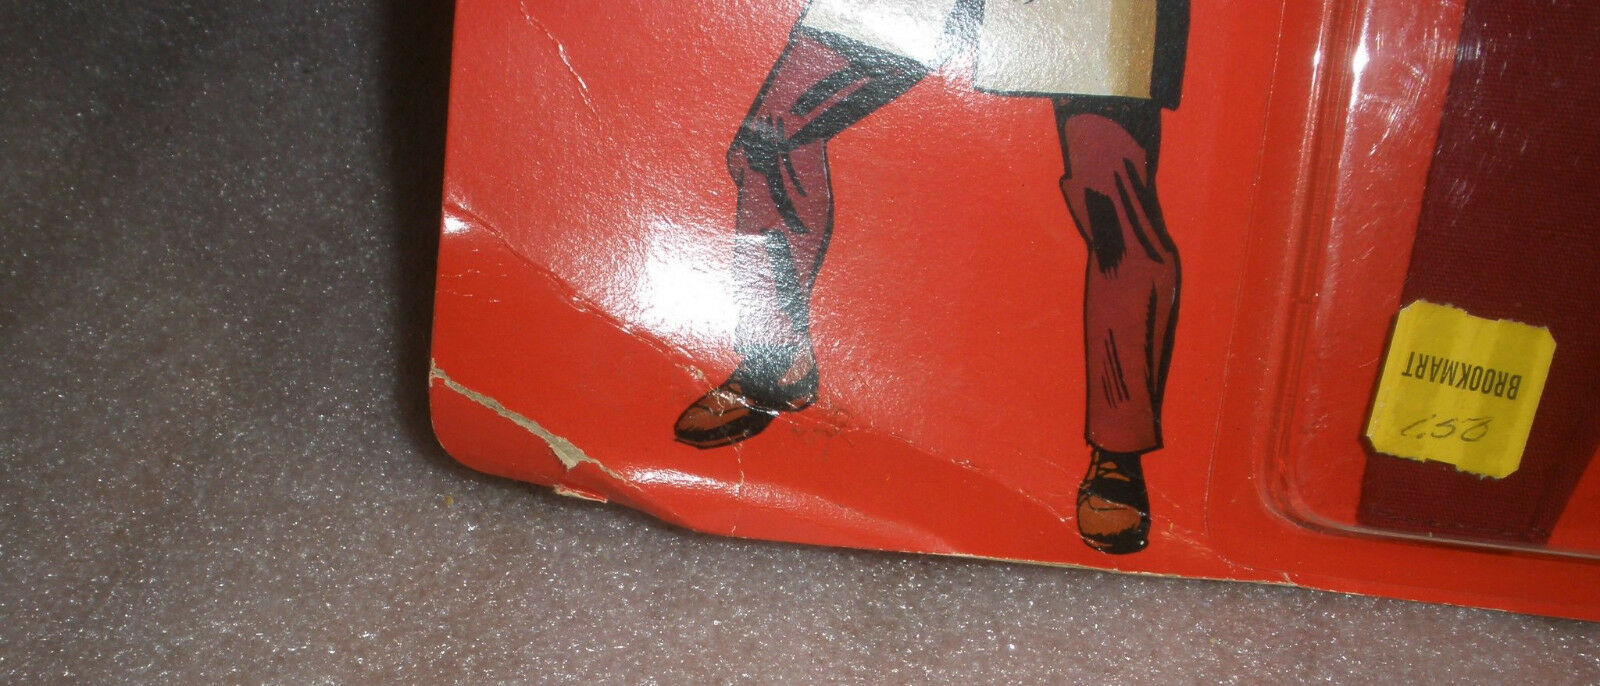 Big Jim Double Trouble Adventure Set Photographer Master Spy Spy Spy Mint on Card RARE 3f6a17